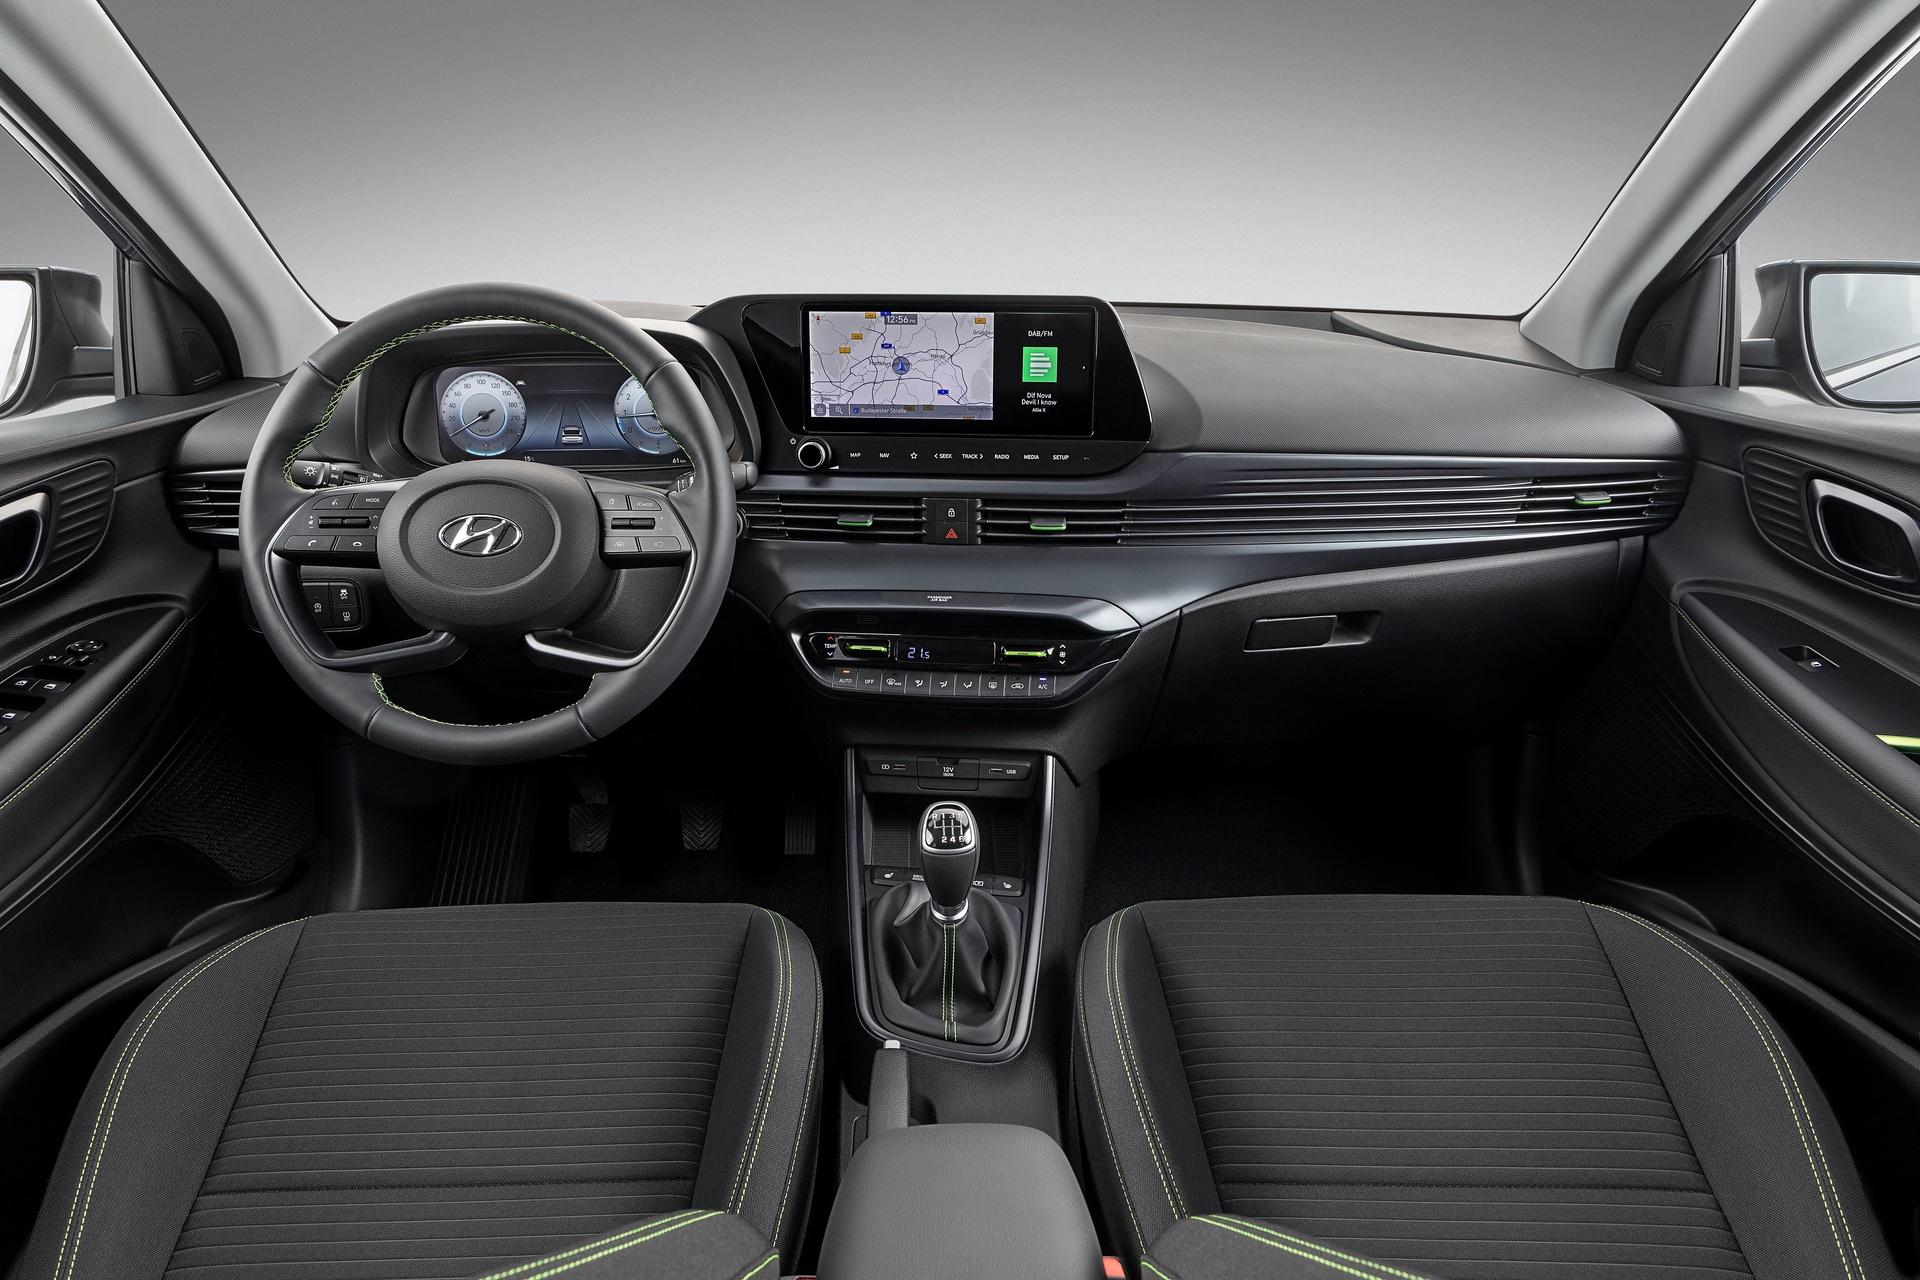 Hyundai_i20_interior_0002